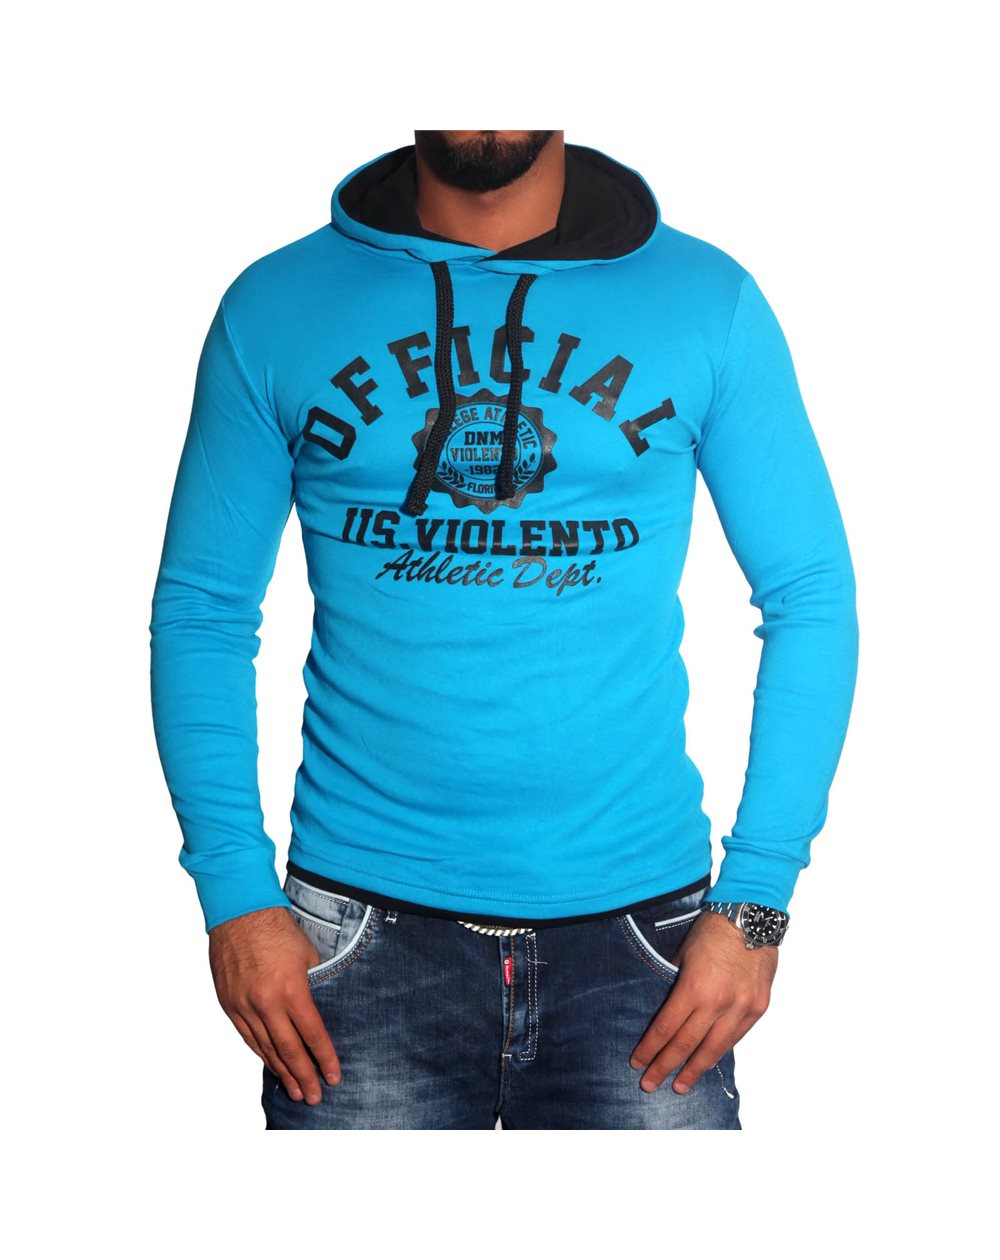 Subliminal Mode - Tee shirt homme manches longues col à cacpuche pull leger SBV0727